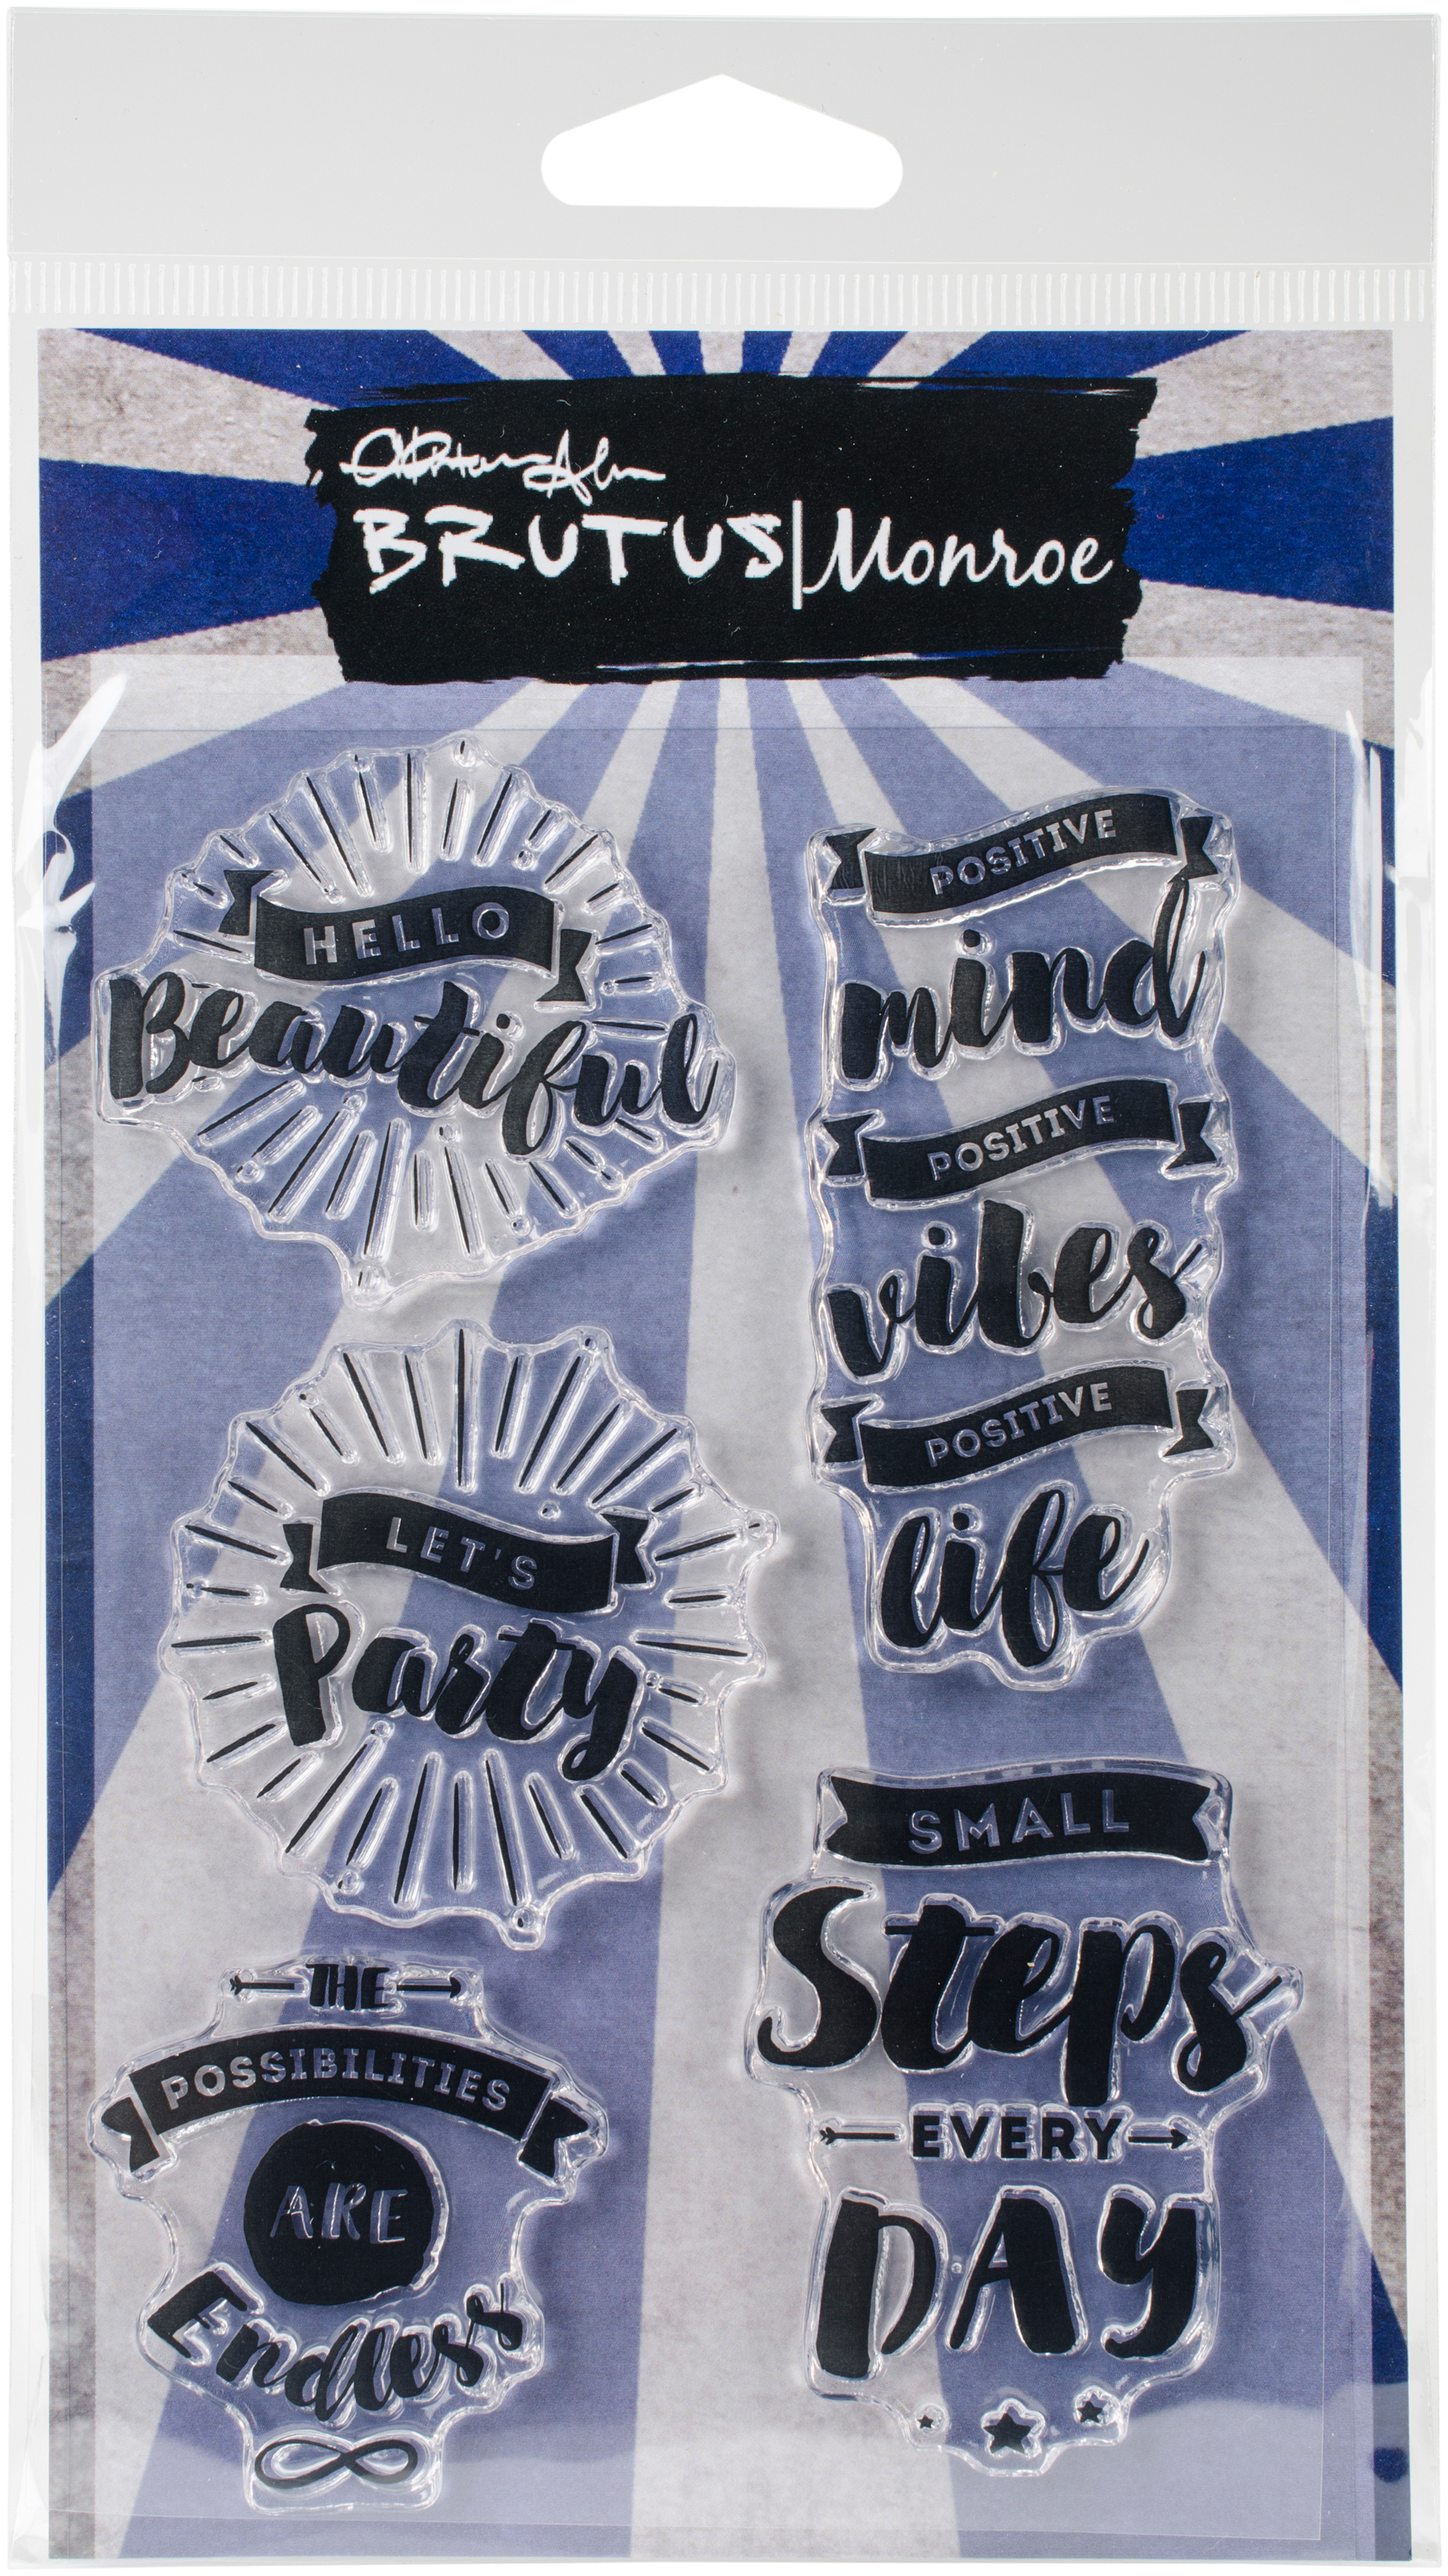 ^Brutus Monroe  - Hello Beautiful - Stamp